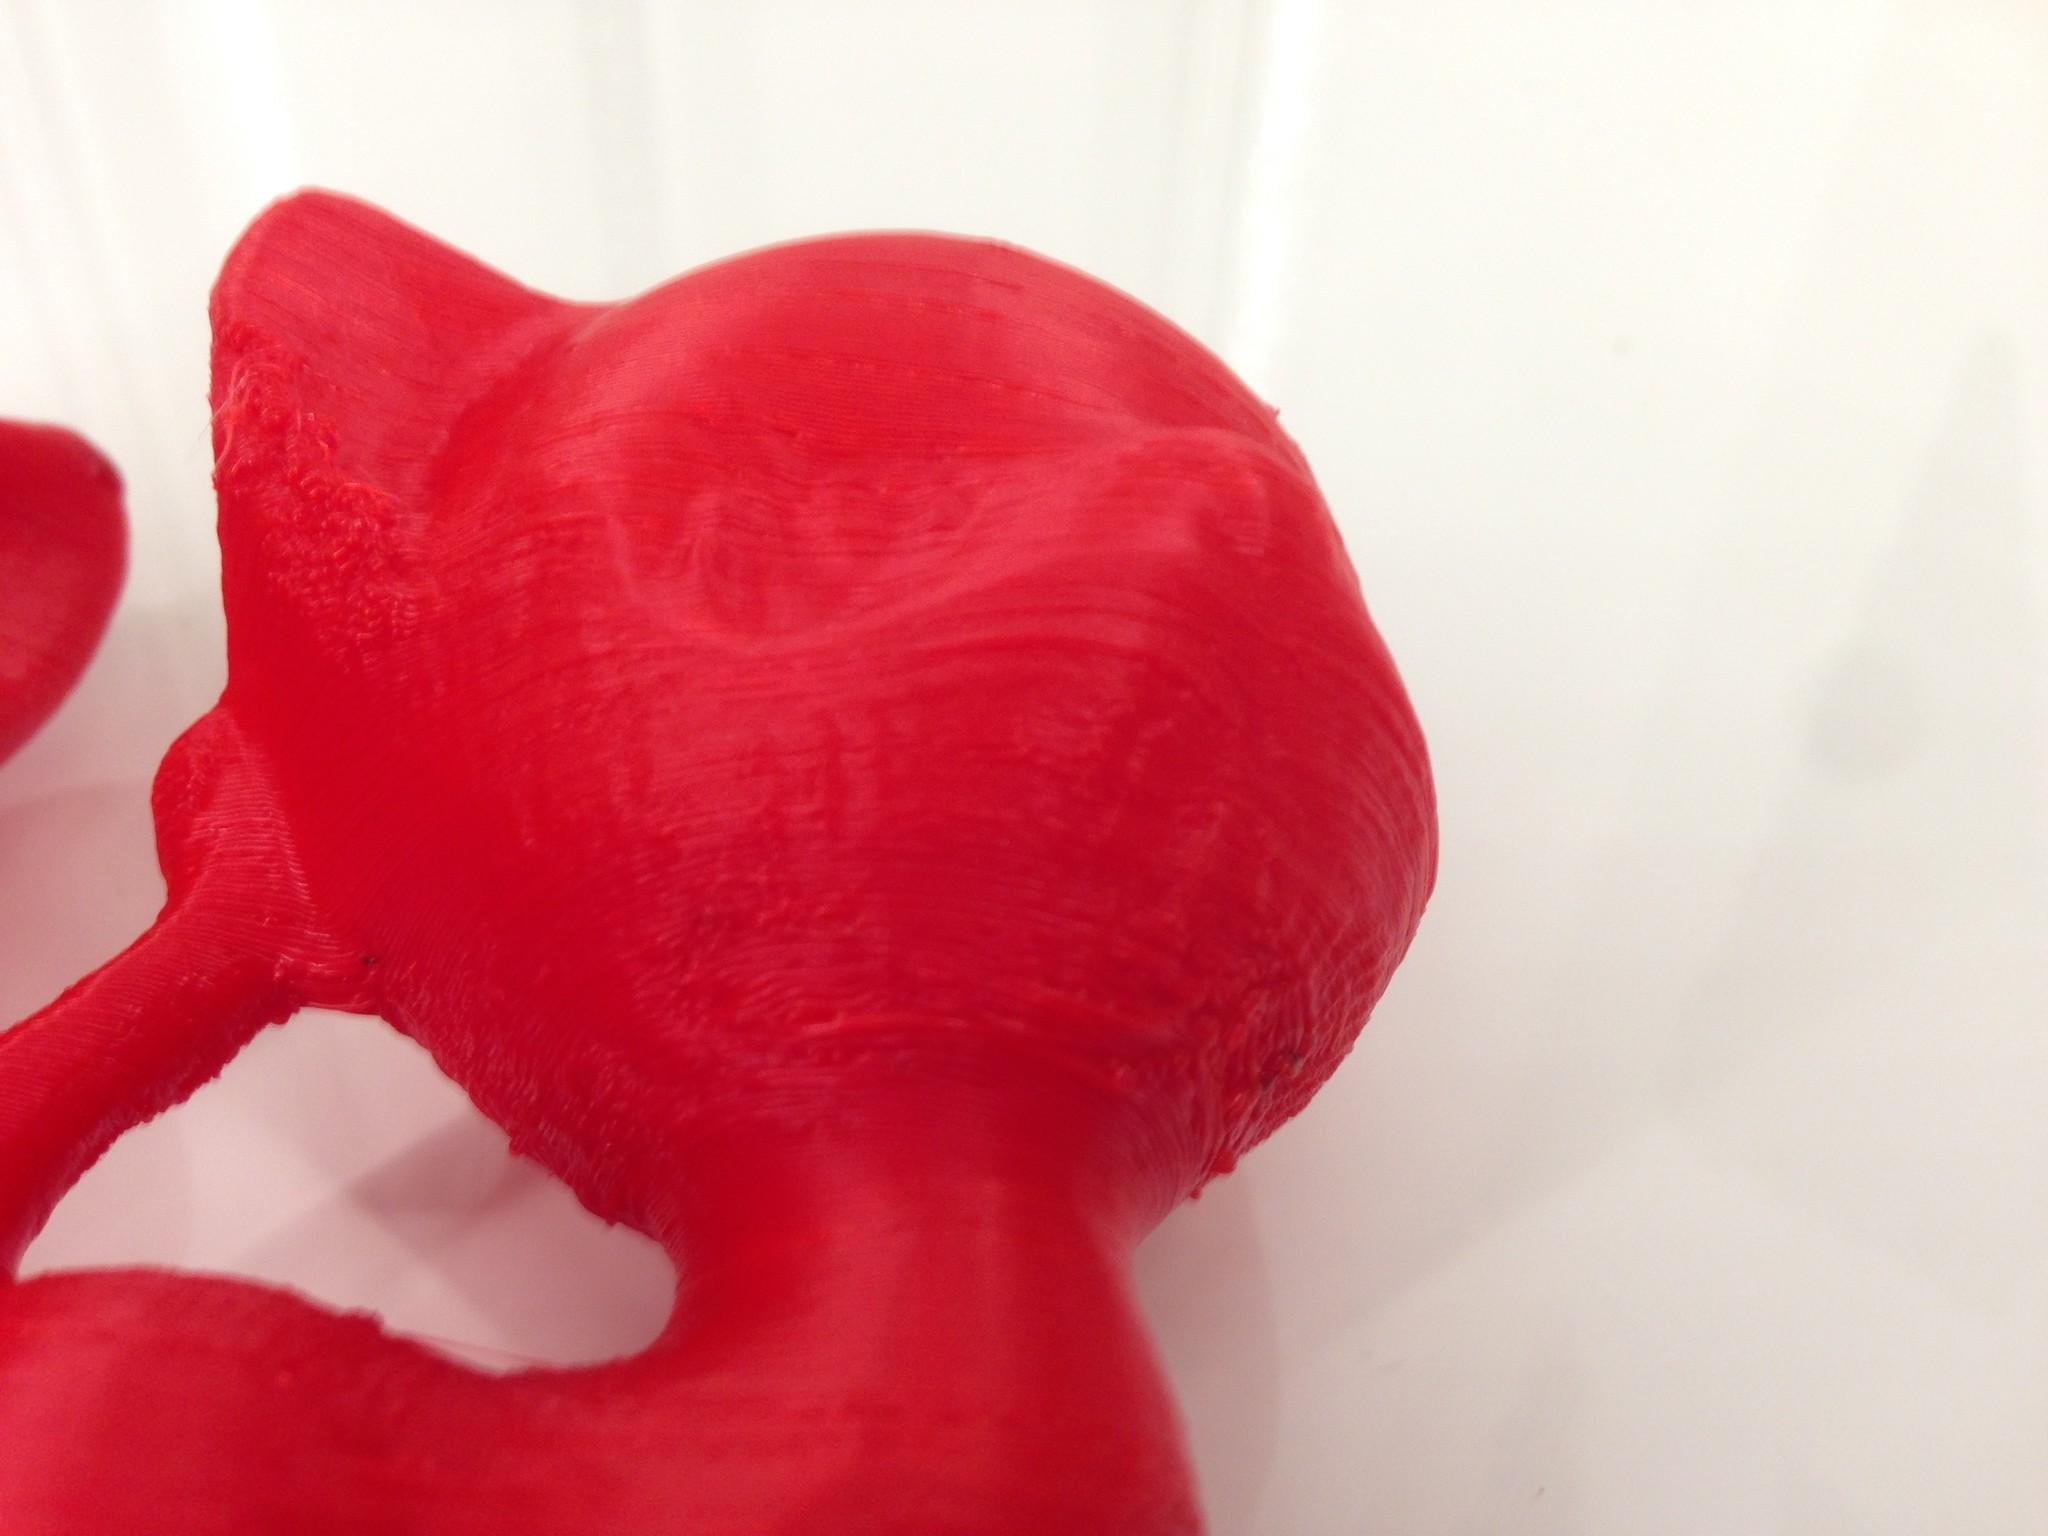 3D-Printing Overhang | Prevent a Ugly 3D-Prints - Hestay